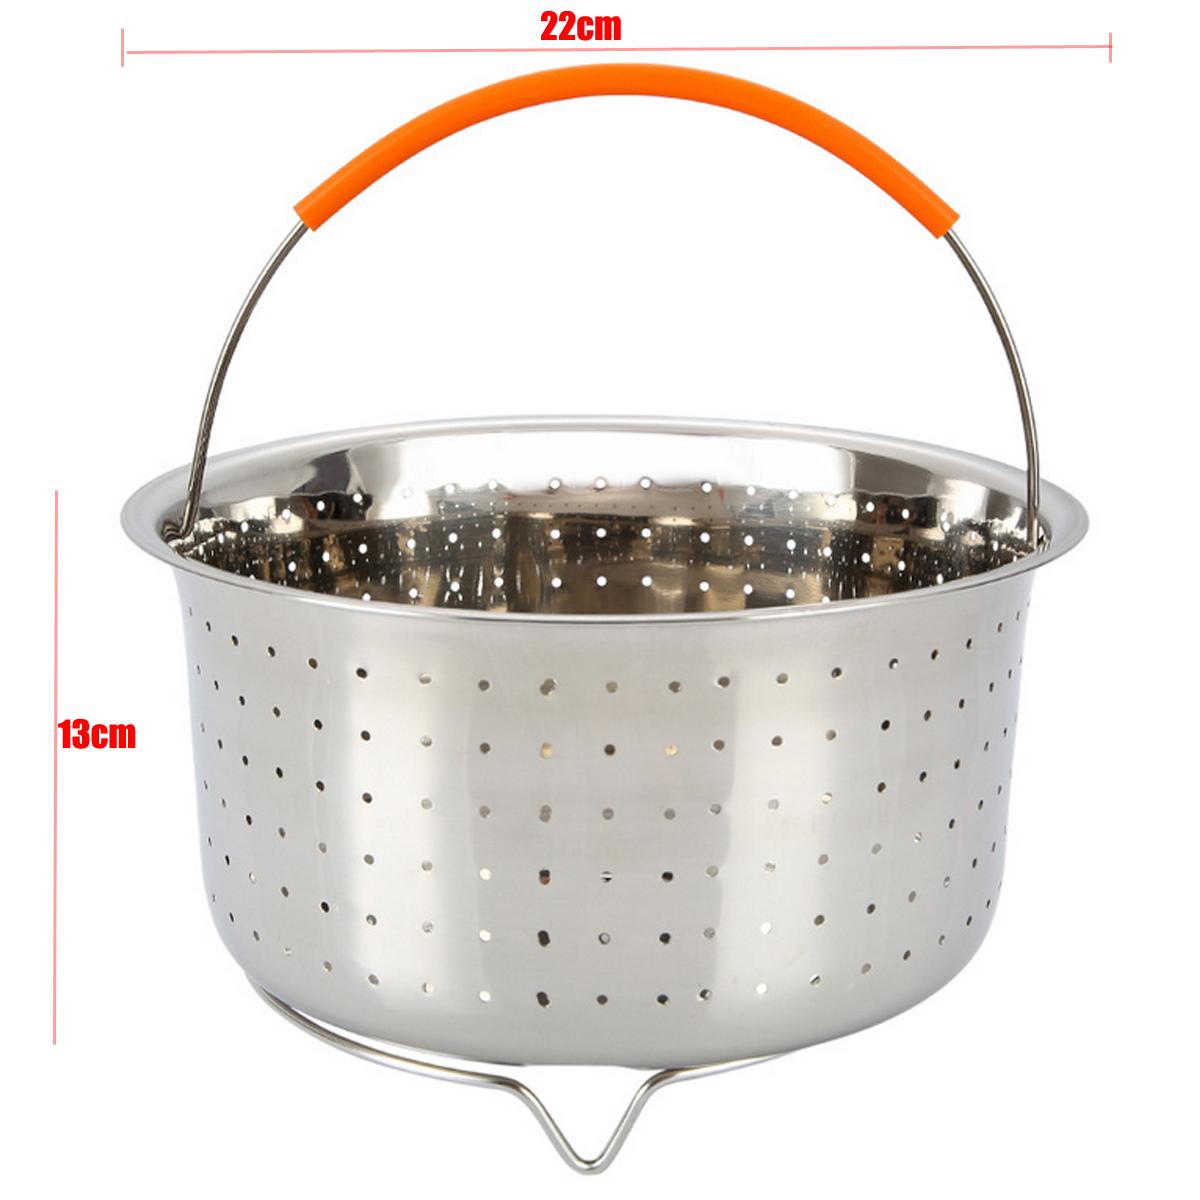 304 stainless steel steam steamer w handle for instant pot rice pressure cooker ebay. Black Bedroom Furniture Sets. Home Design Ideas